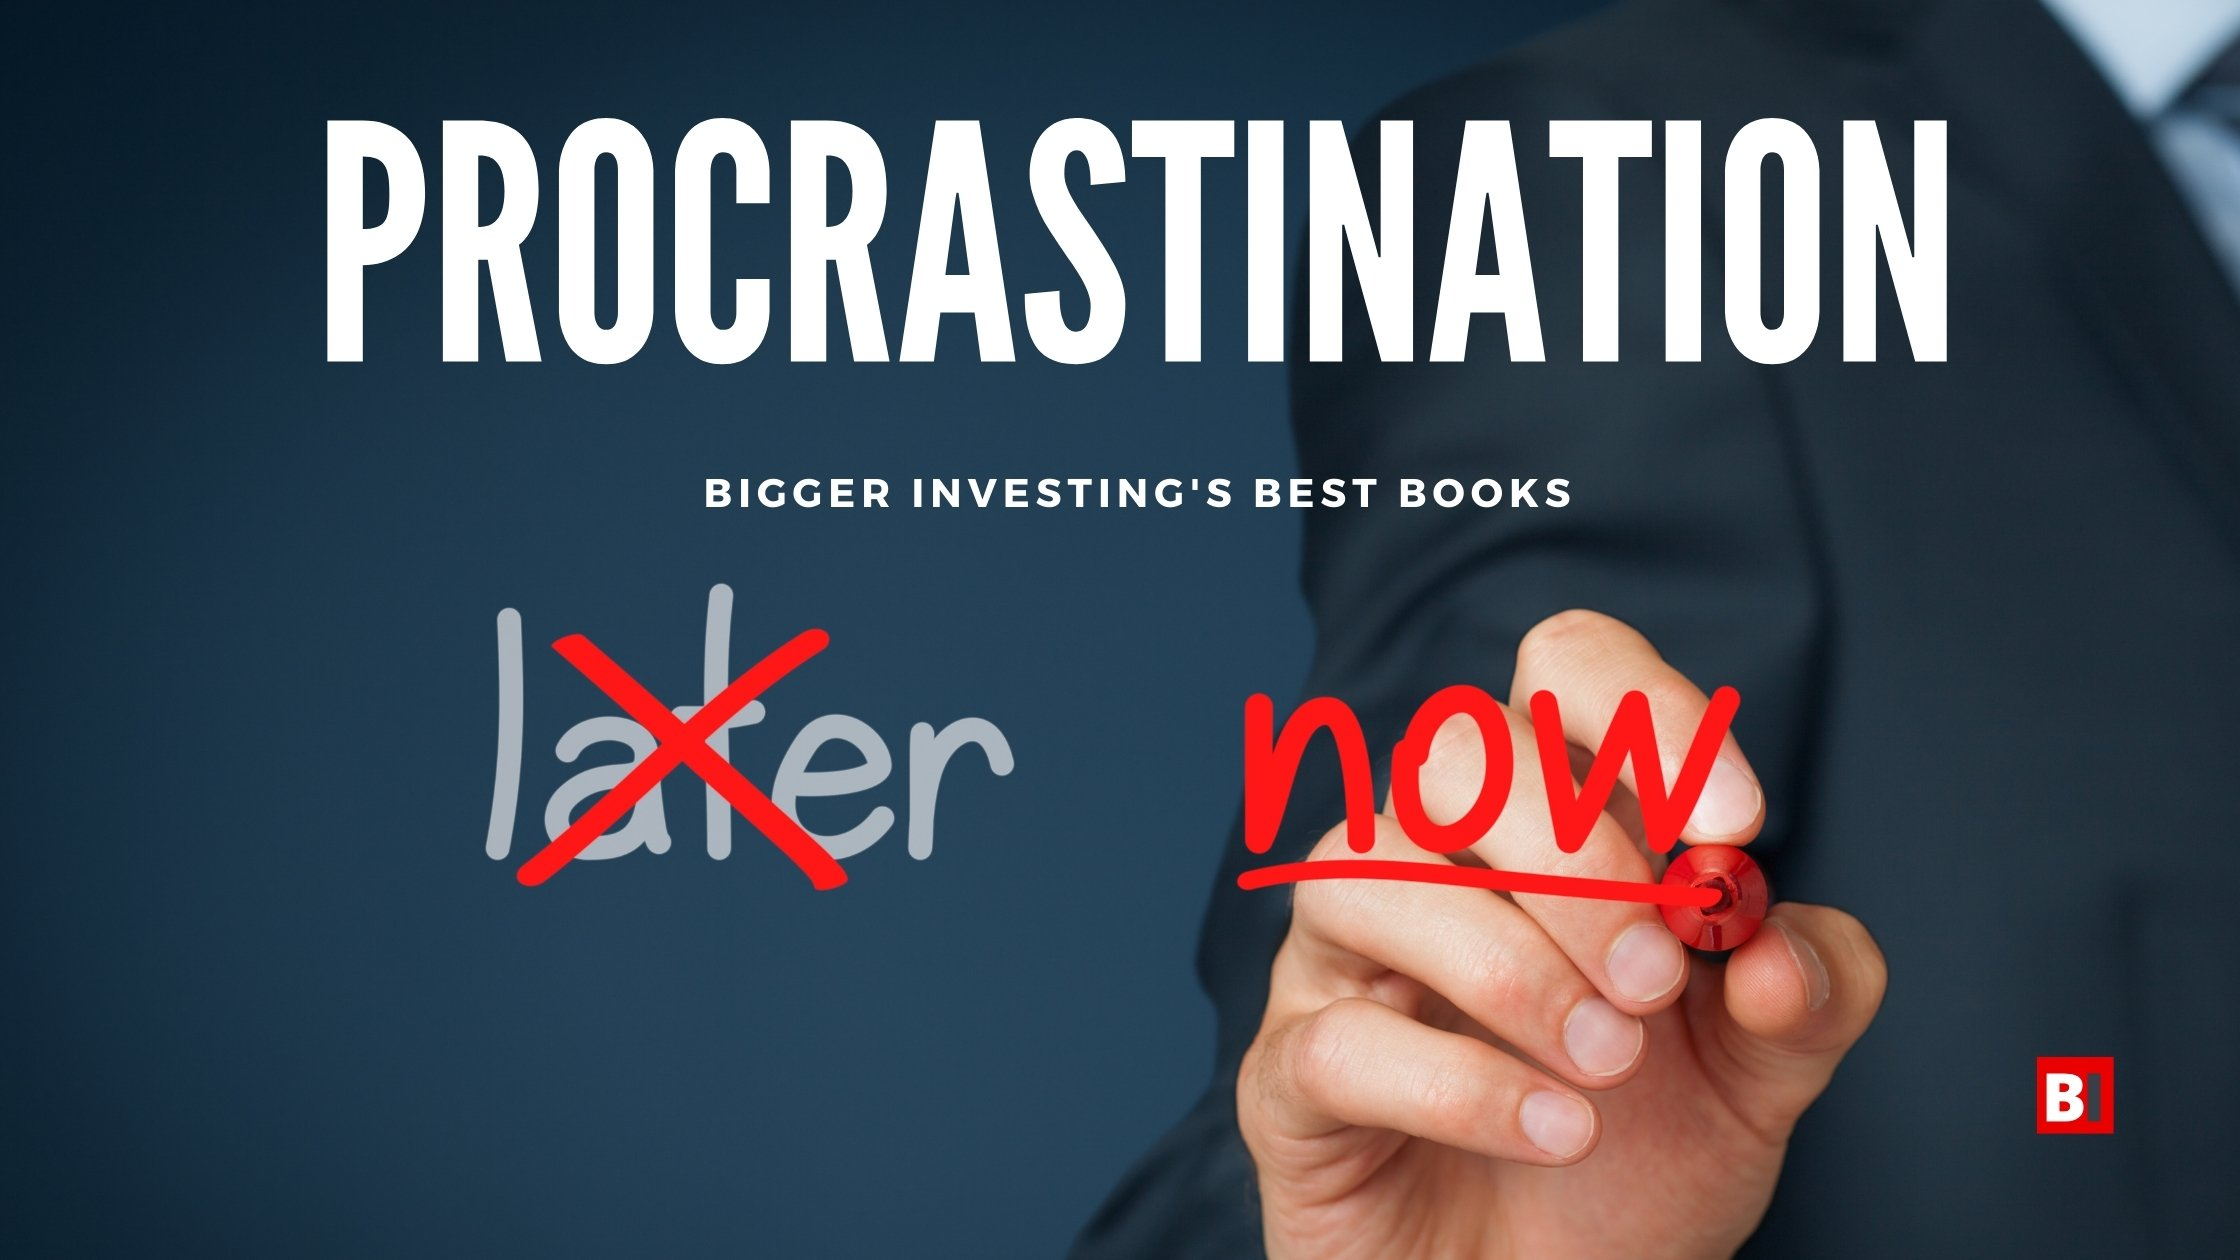 Best Books on Procrastination